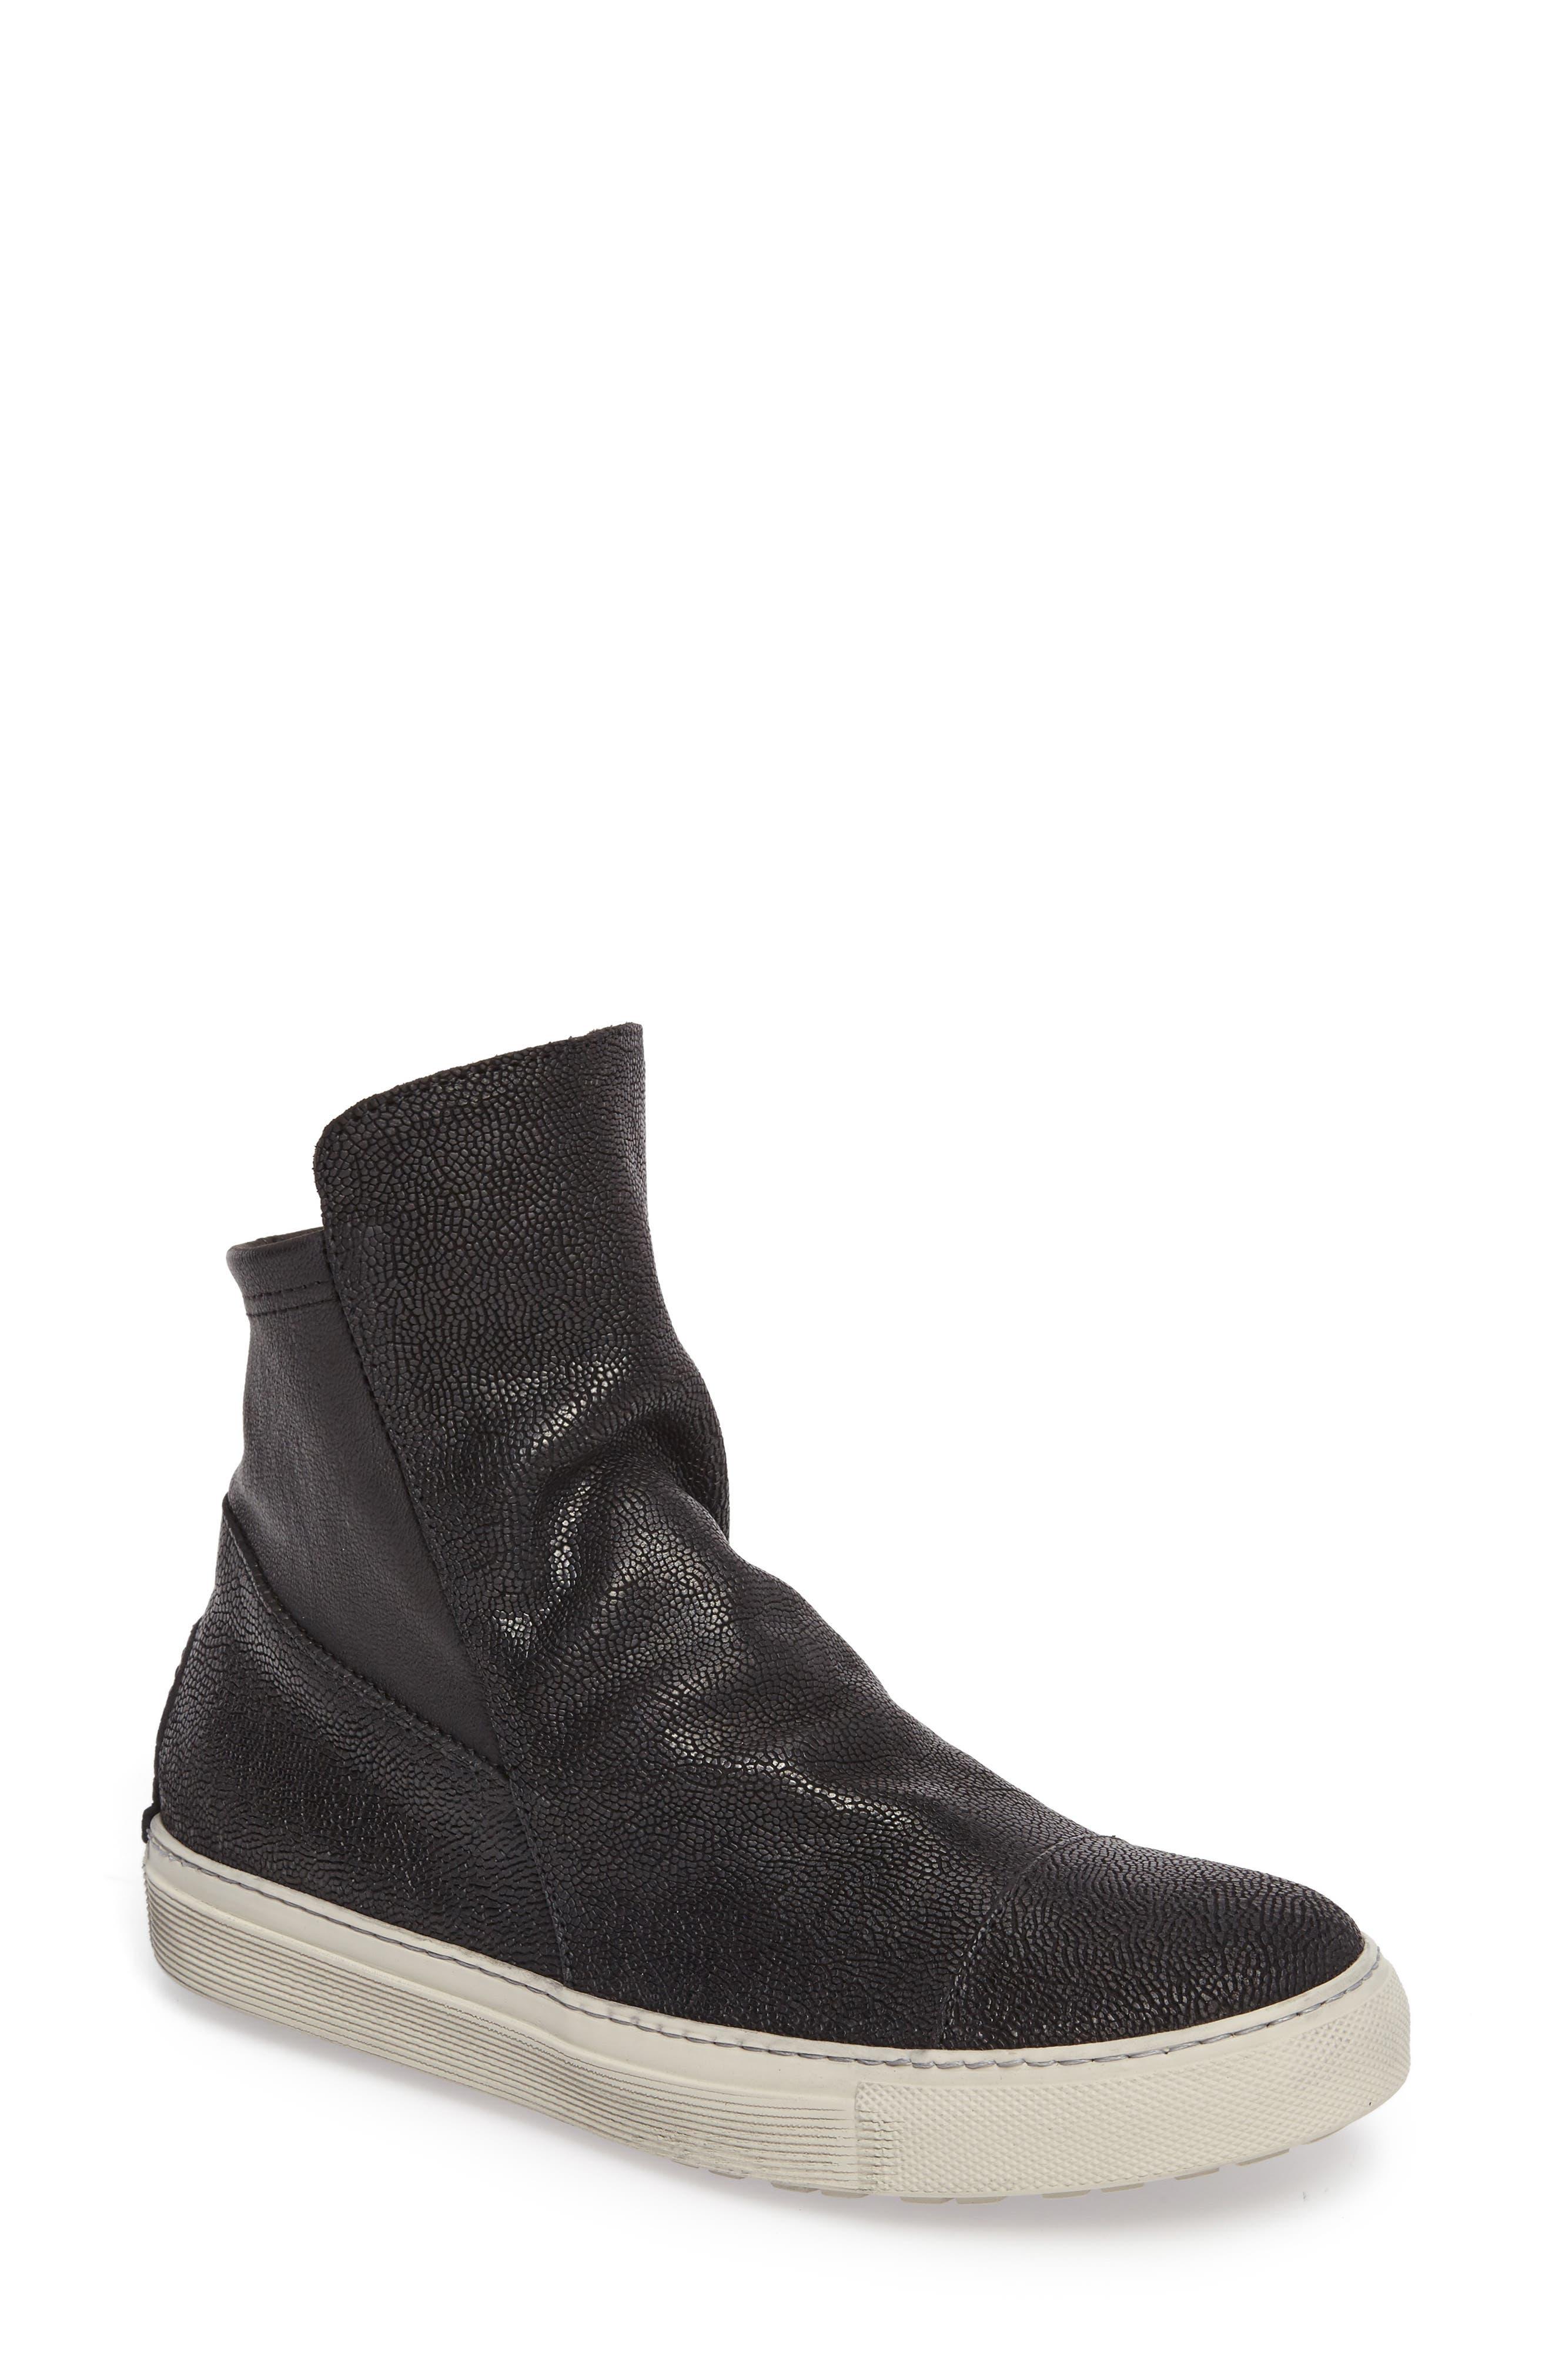 Fiorentini & Baker Bret Boot,                         Main,                         color, 001